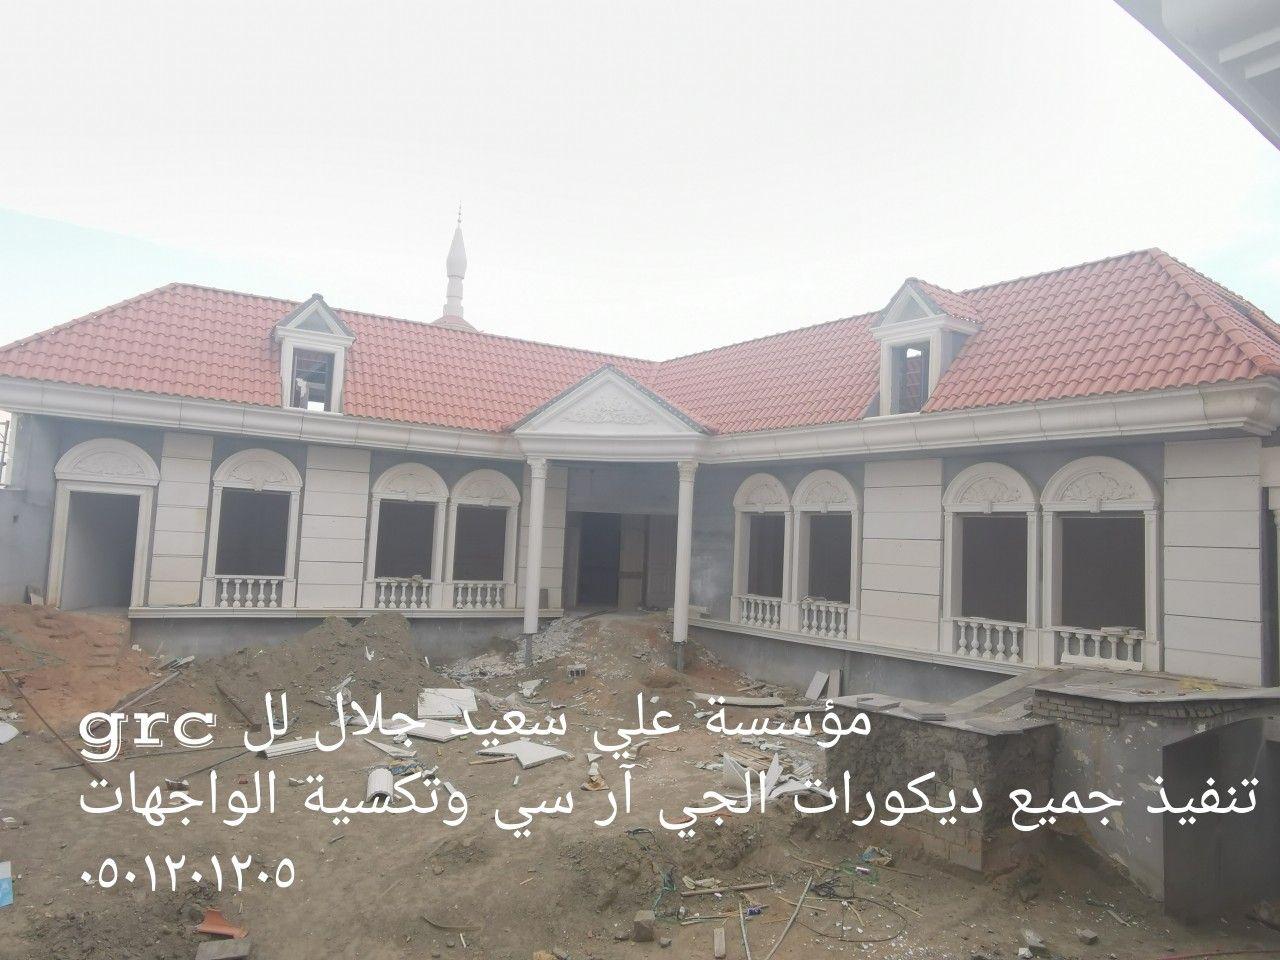 Pin By عبدالرحمن التلاوي On Grc Decor 0501201205 House Styles Mansions House